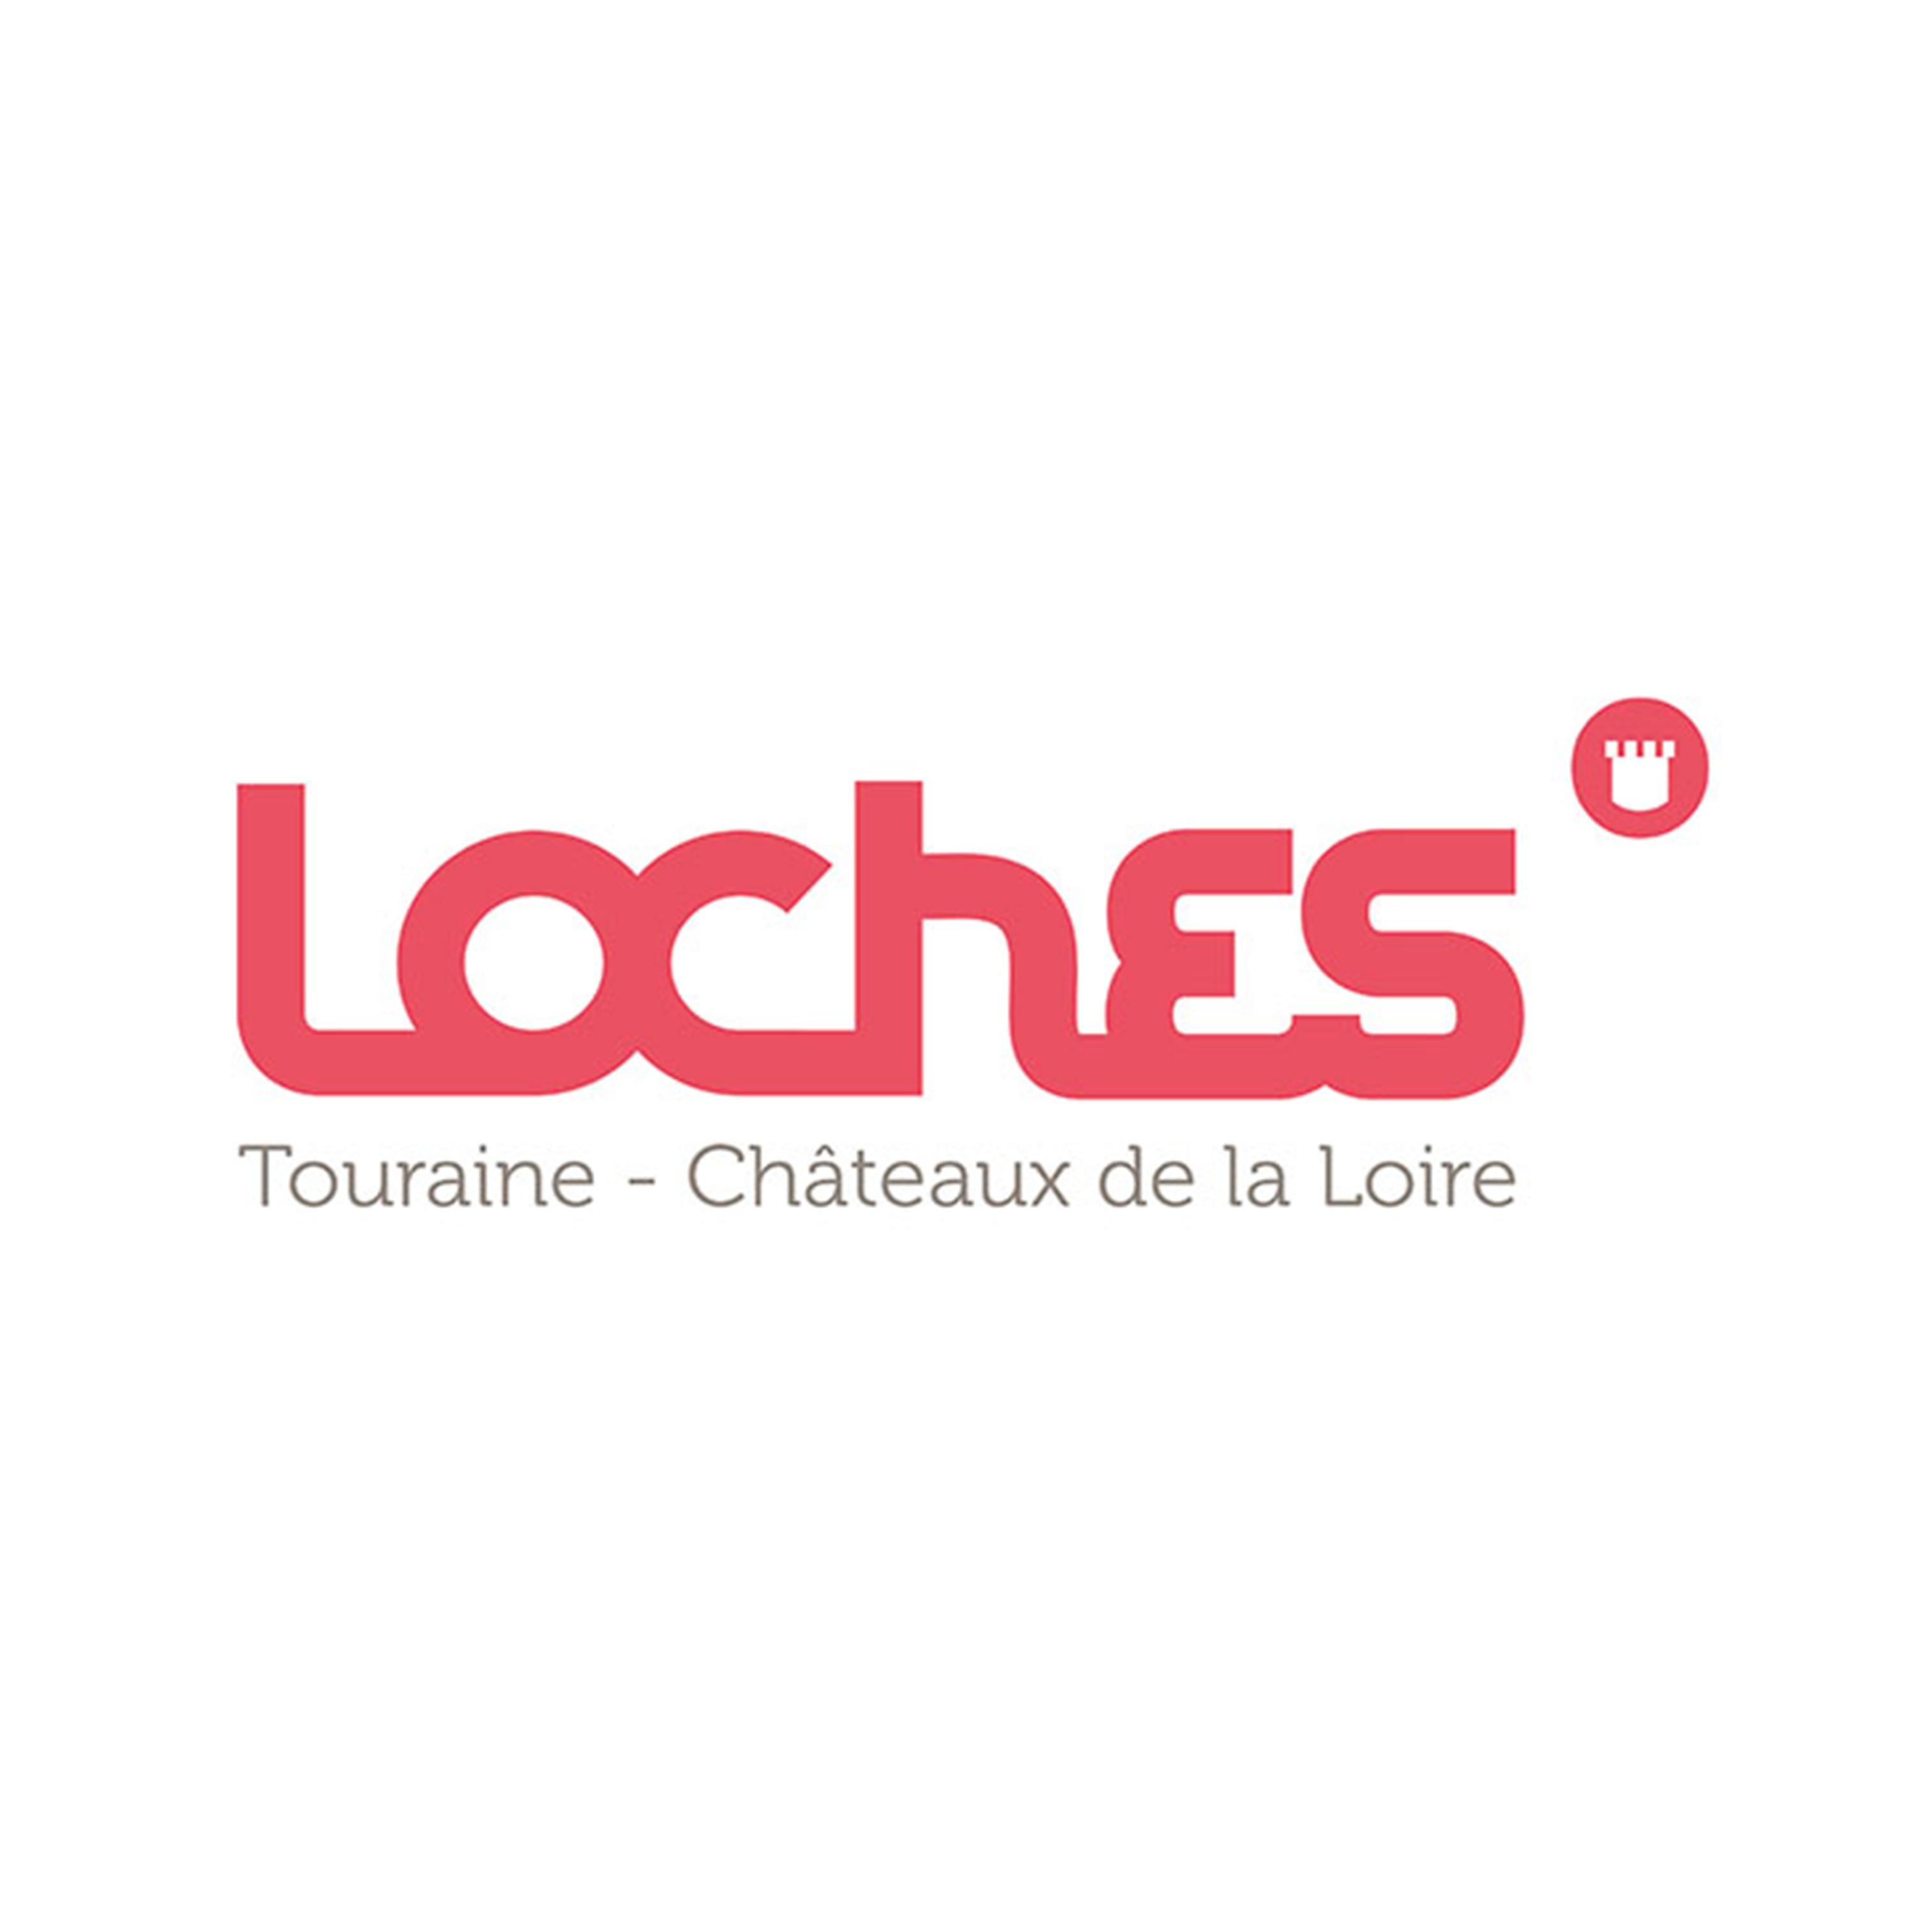 chateau-loches